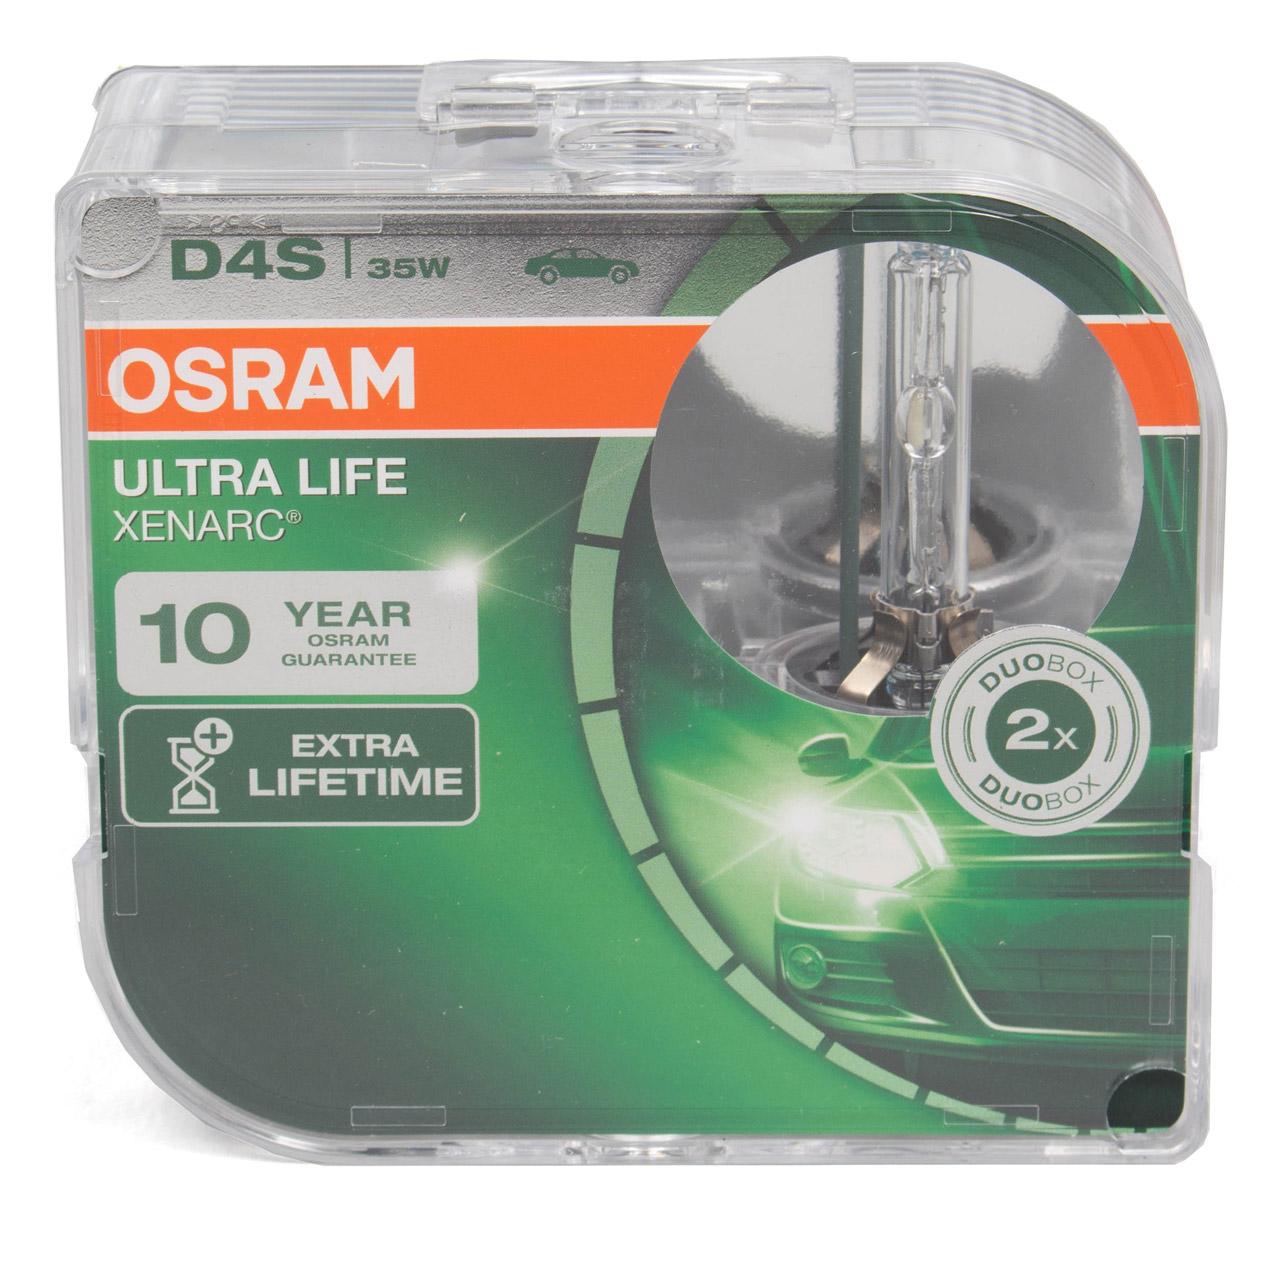 2x OSRAM Xenon Brenner D4S ULTRA LIFE XENARC 42V 35W P32d-5 66440ULT-HCB